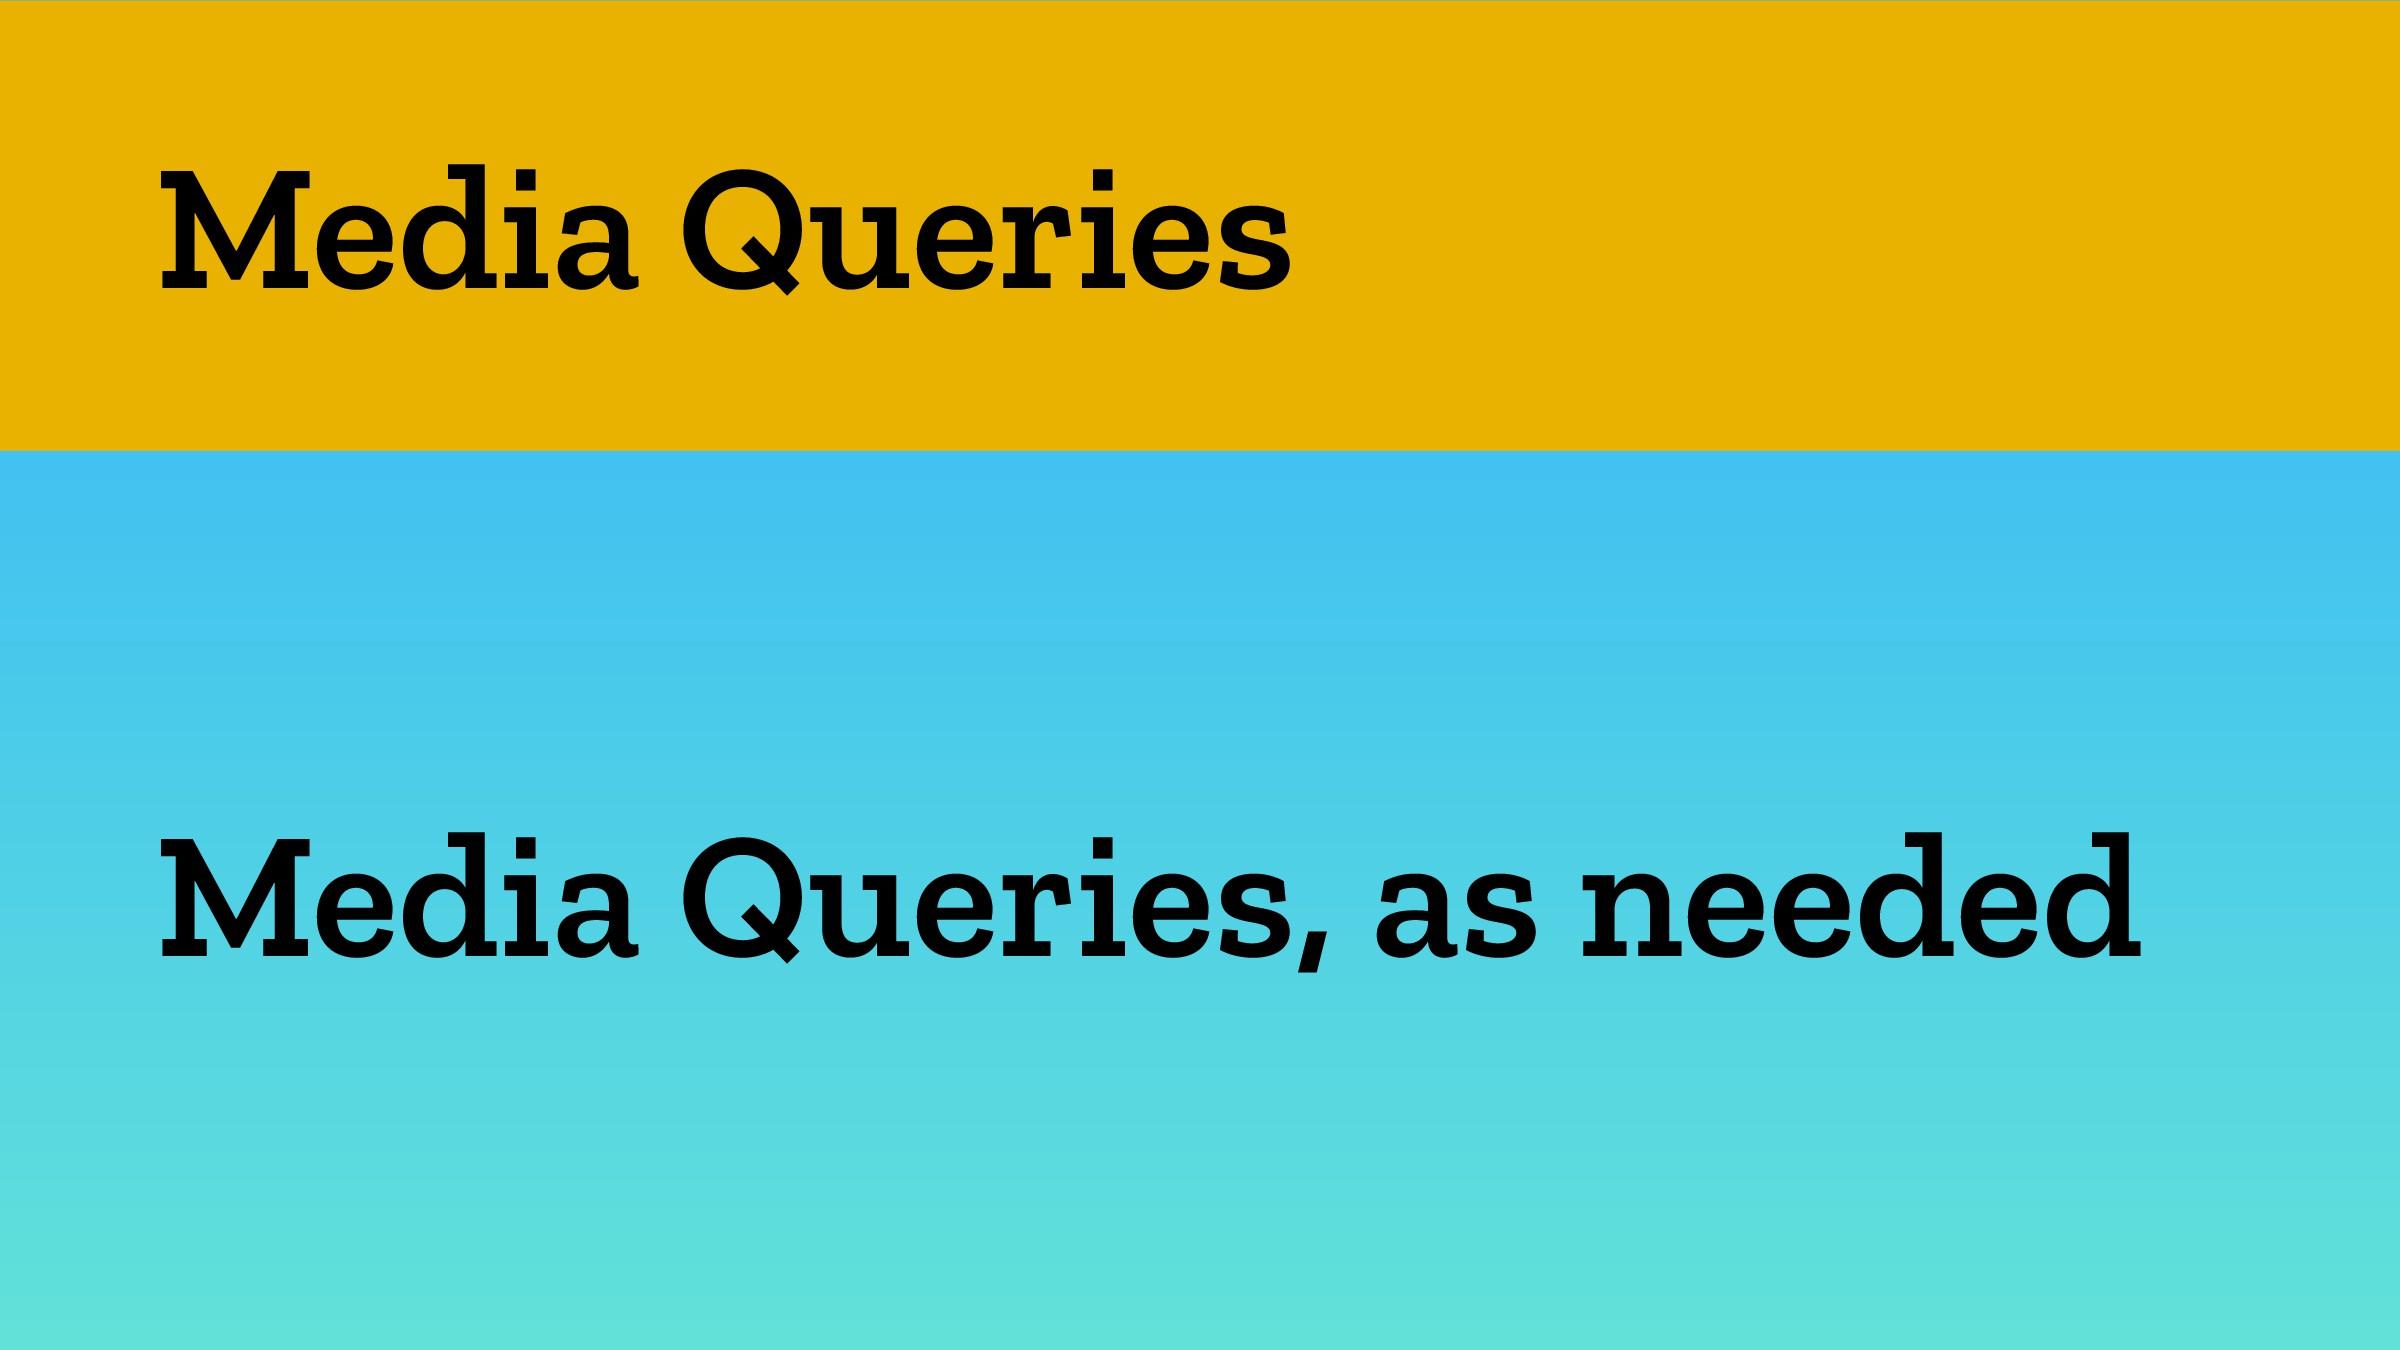 Media Queries Media Queries, as needed